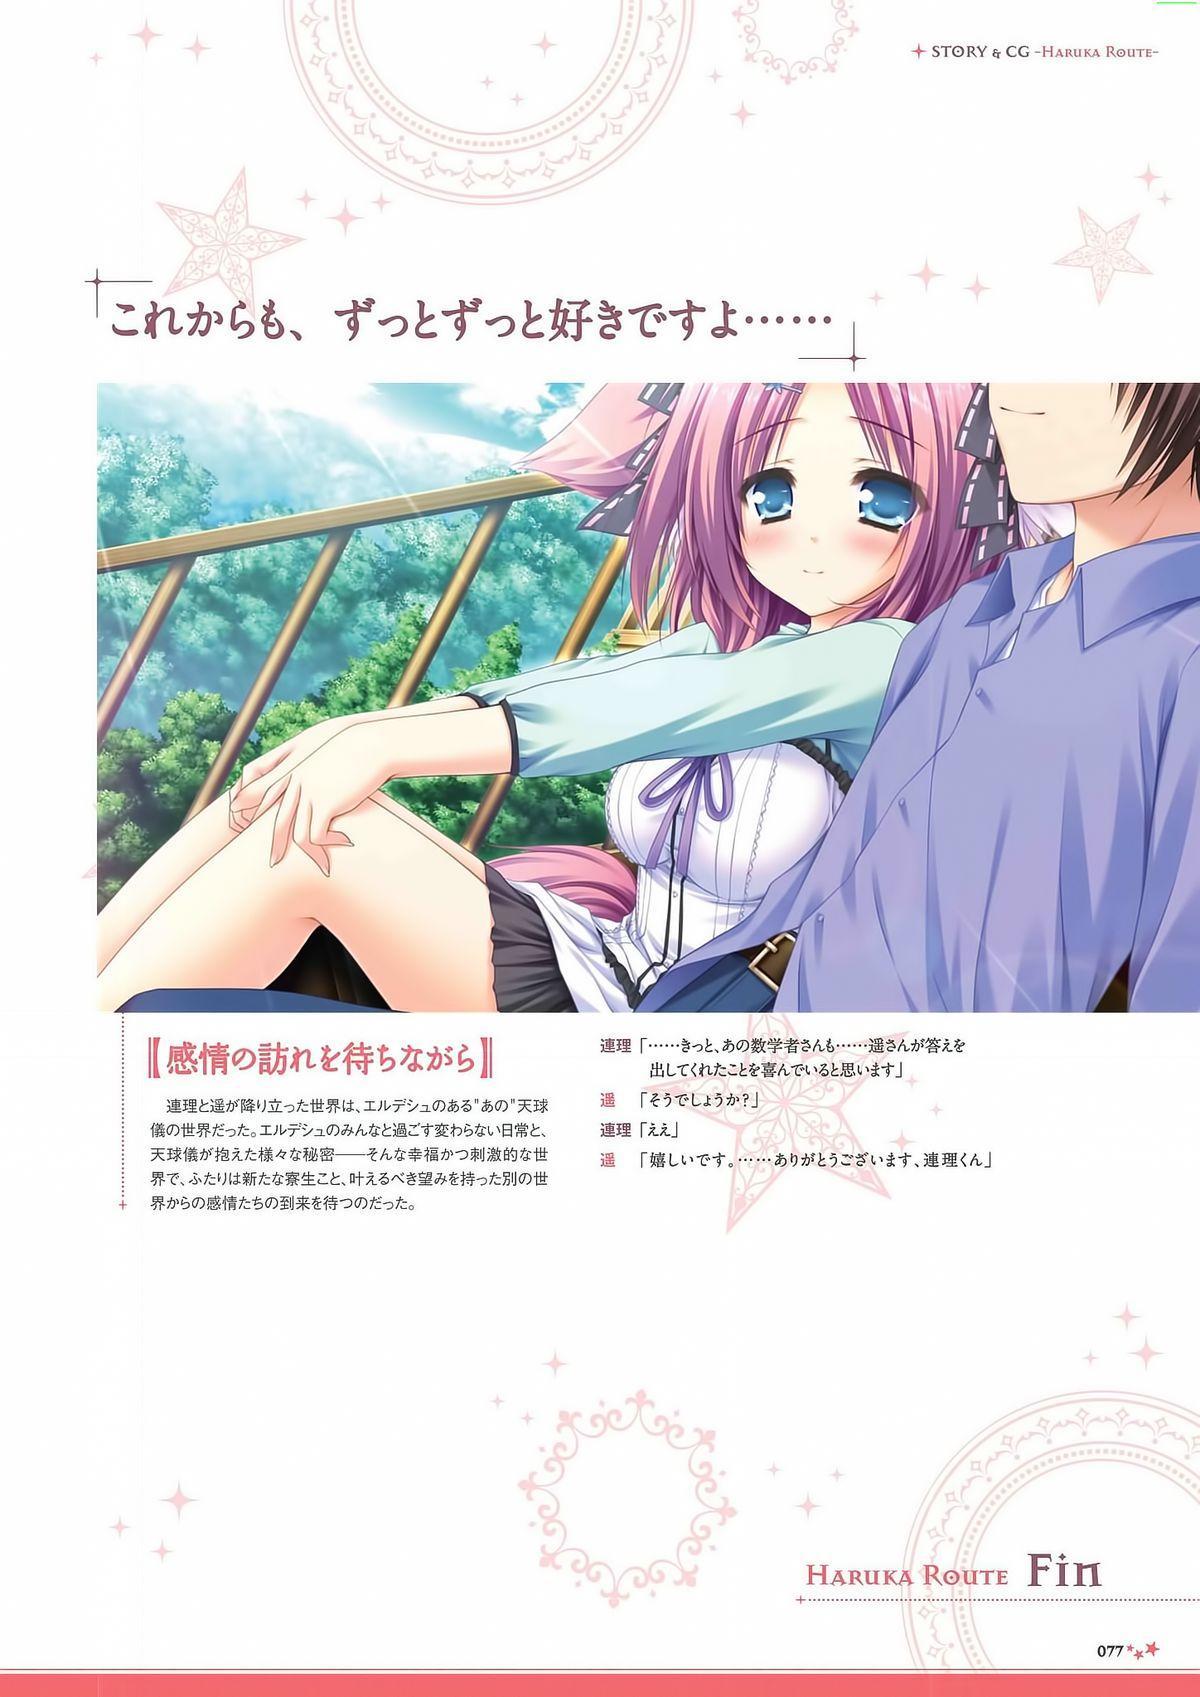 Sekai to Sekai no Mannaka de Visual Fanbook 77